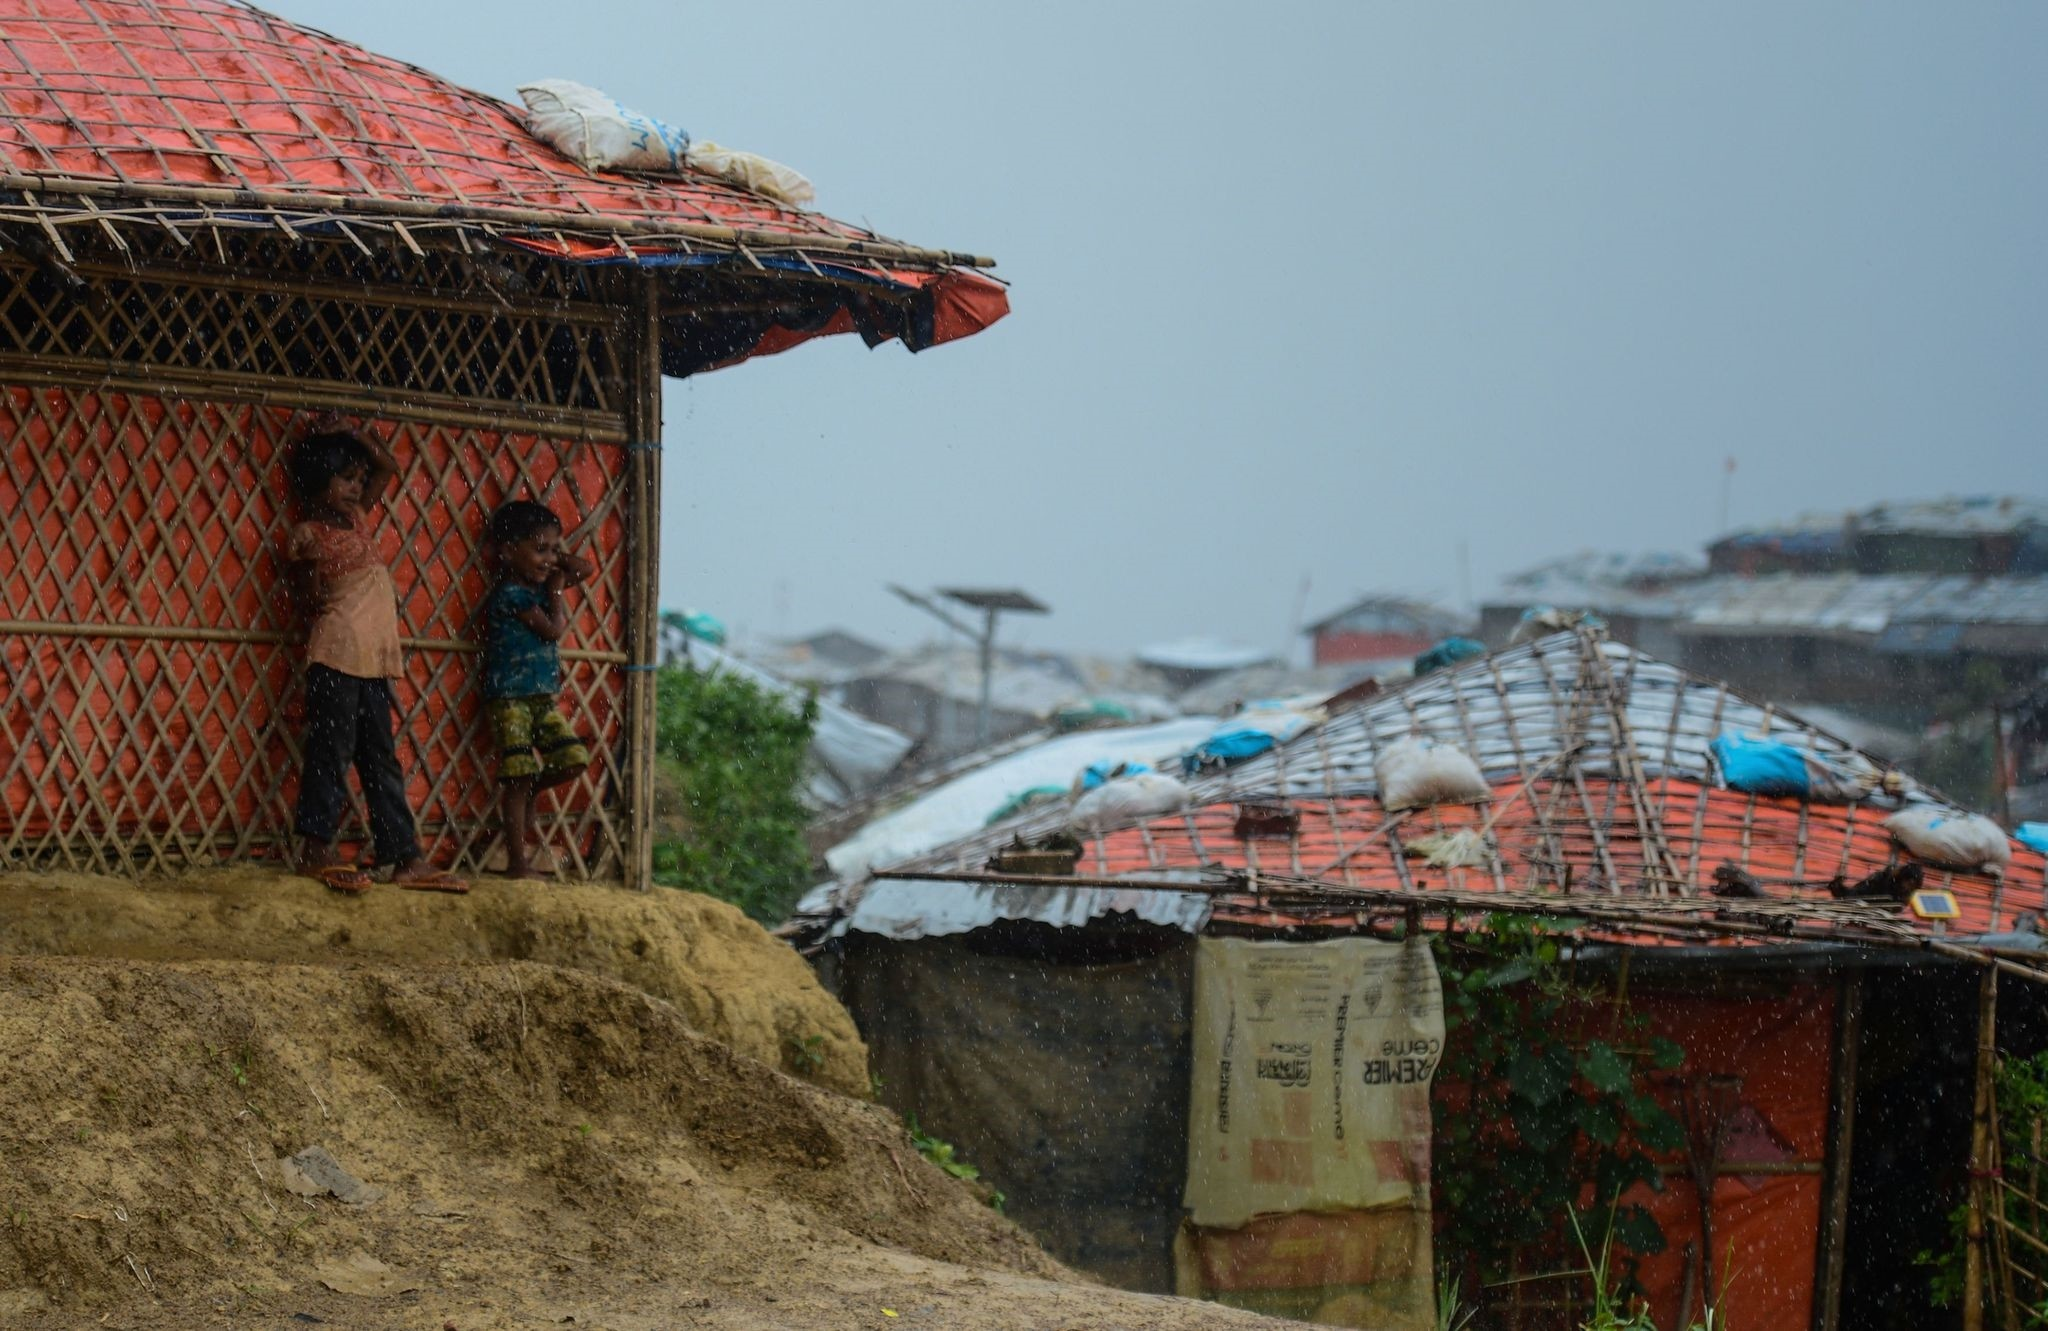 Rohingya refugee children take shelter during a rain storm at Balukhali refugee camp, Ukhia, July 21.